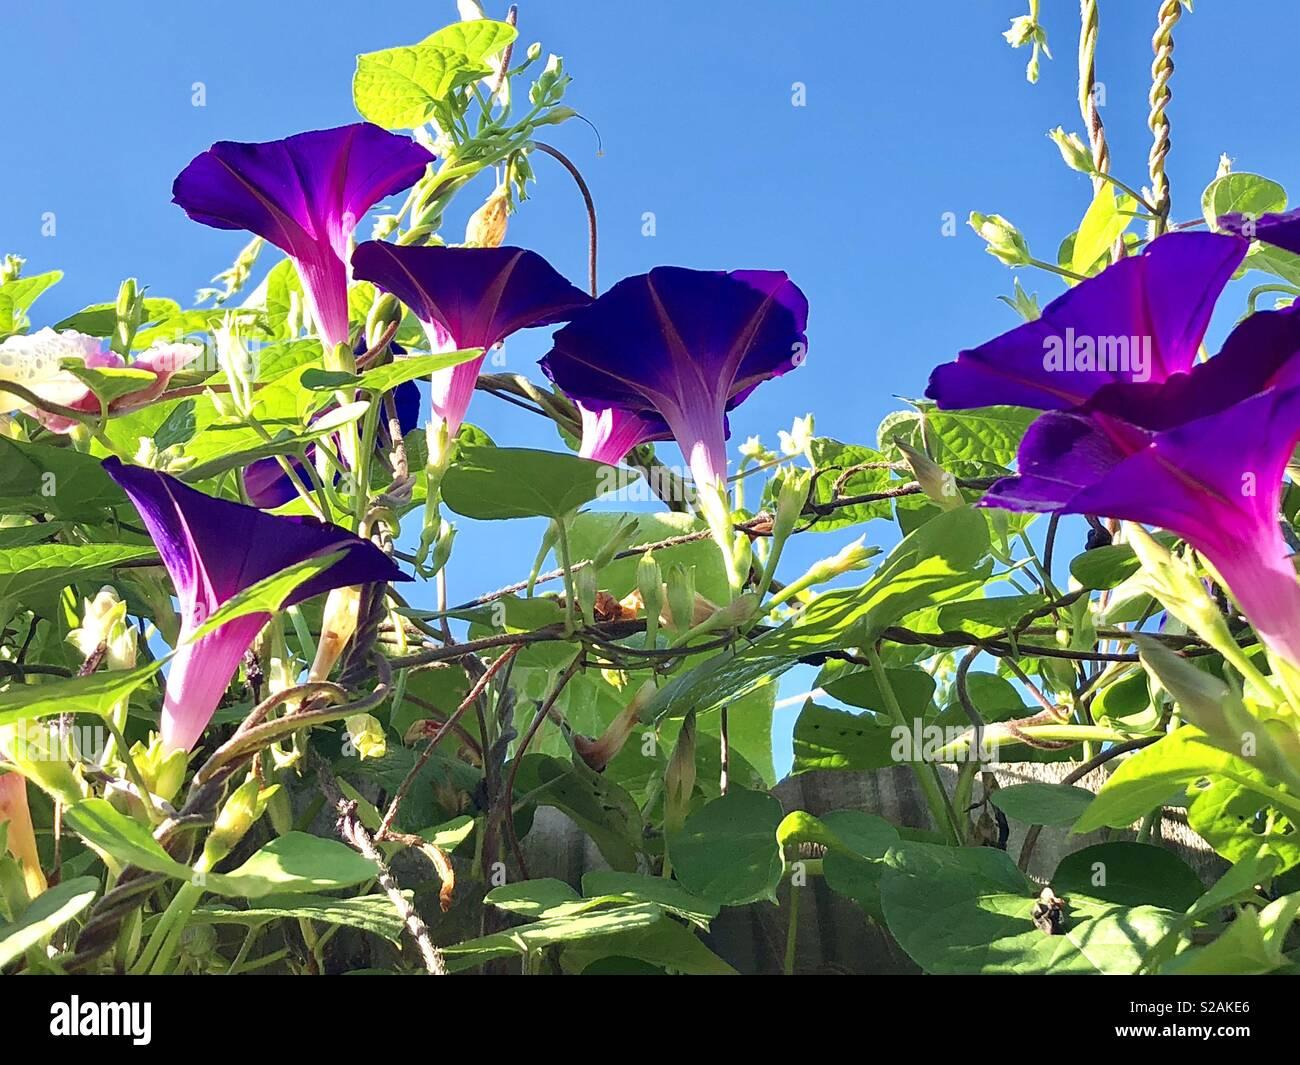 Morning glories - Stock Image